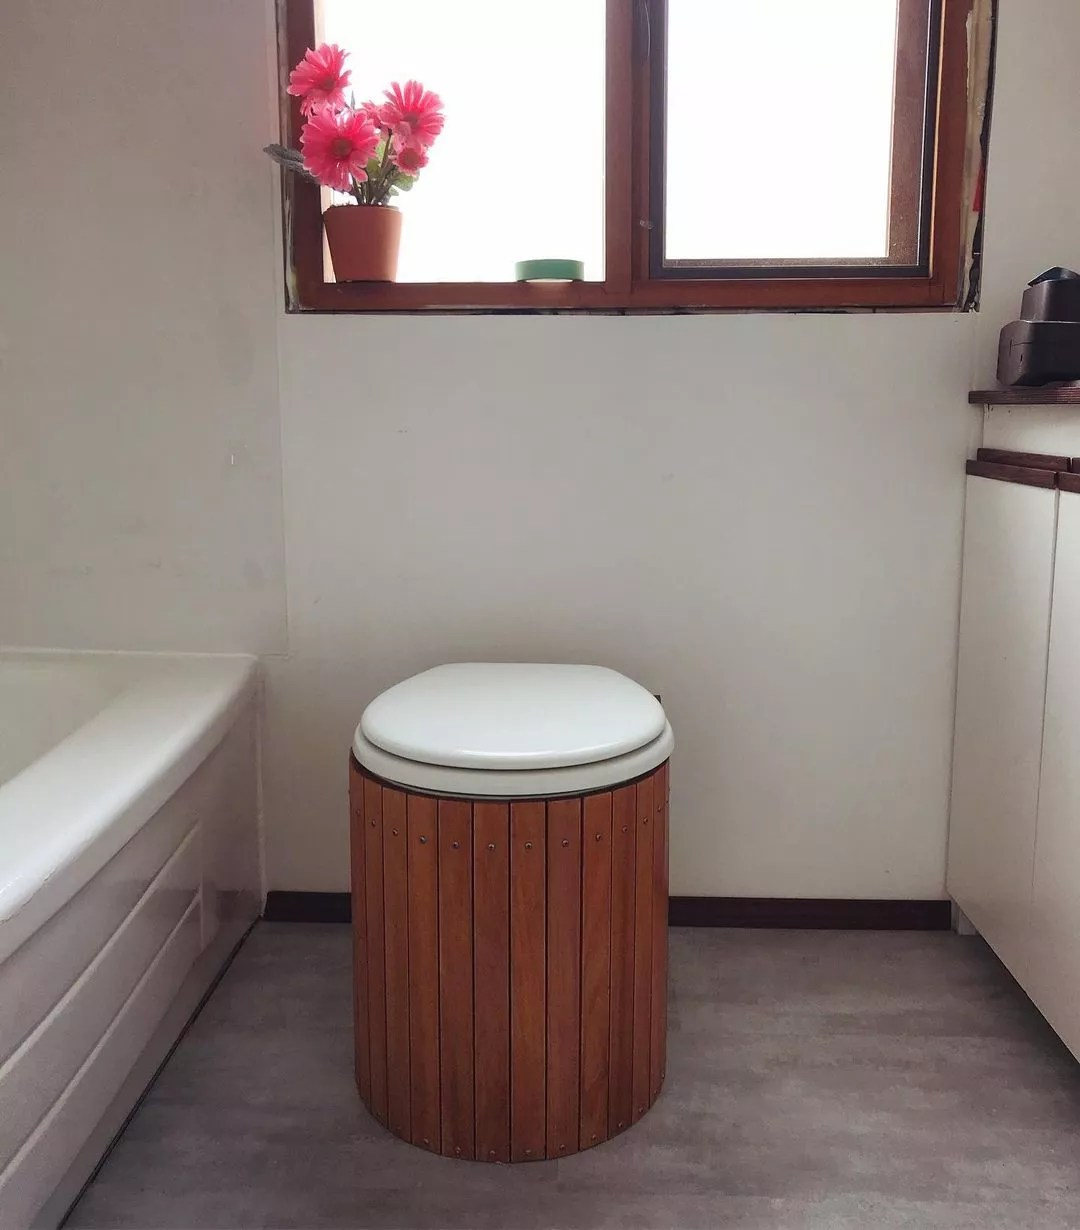 Eco-friendly toilet. Photo by Instagram user @earth.enchantress